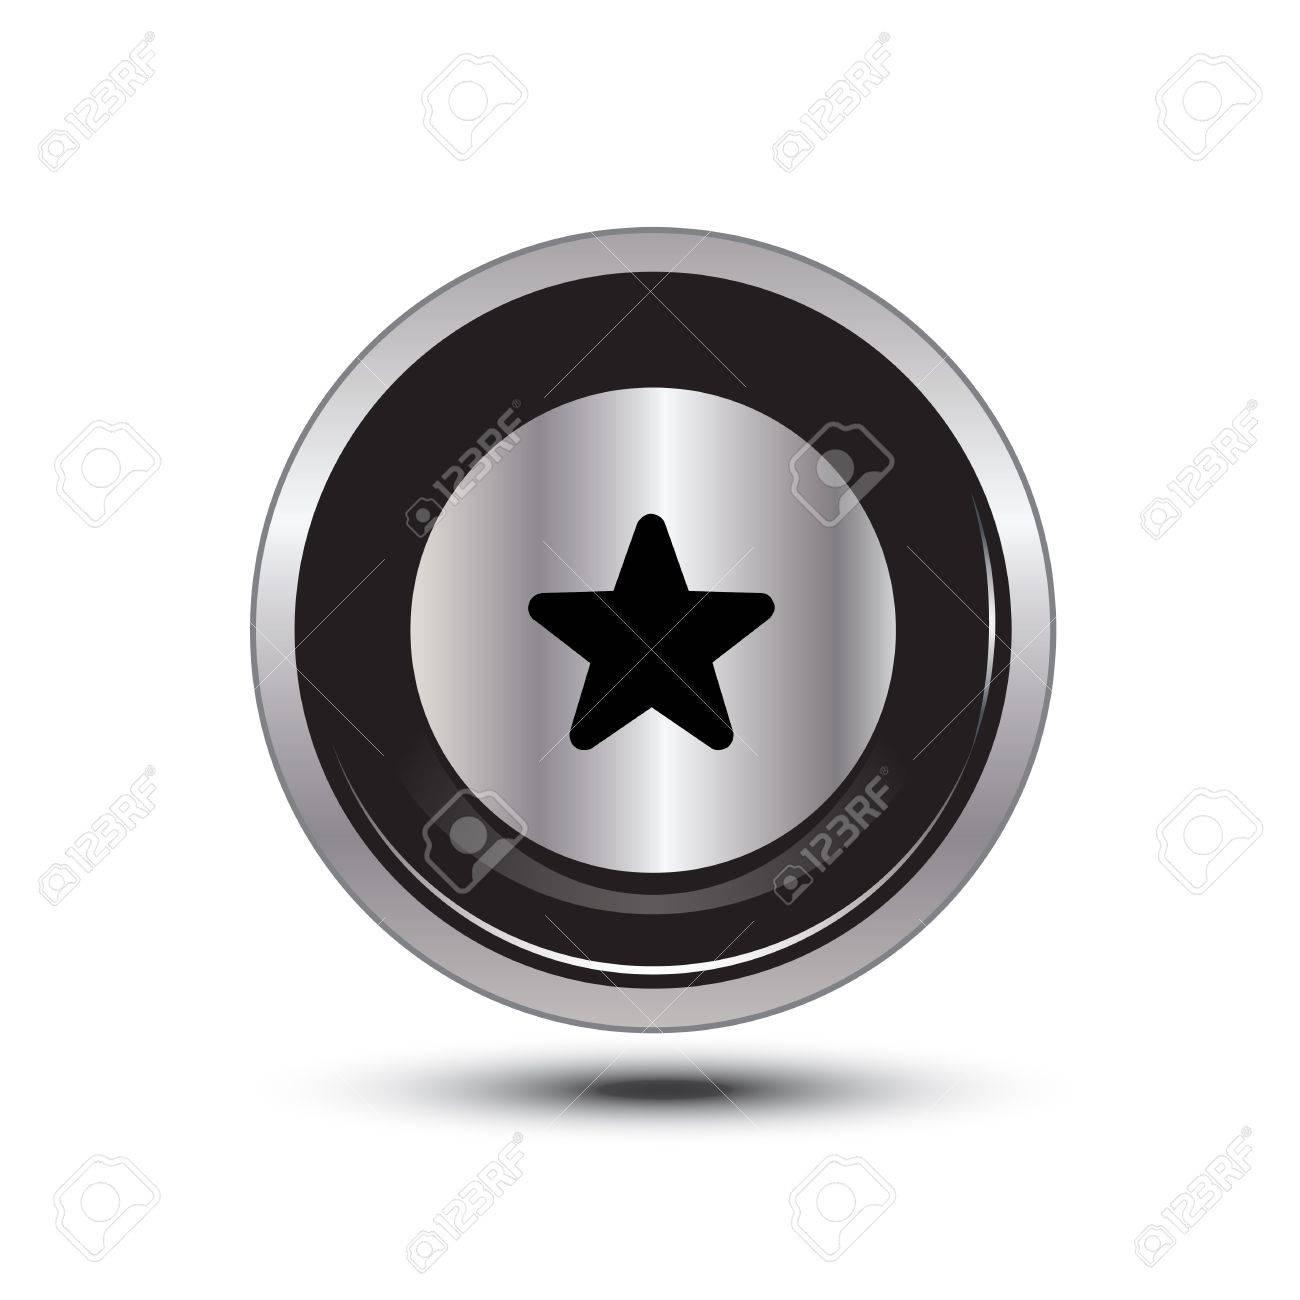 single button aluminum for use Stock Vector - 21137690